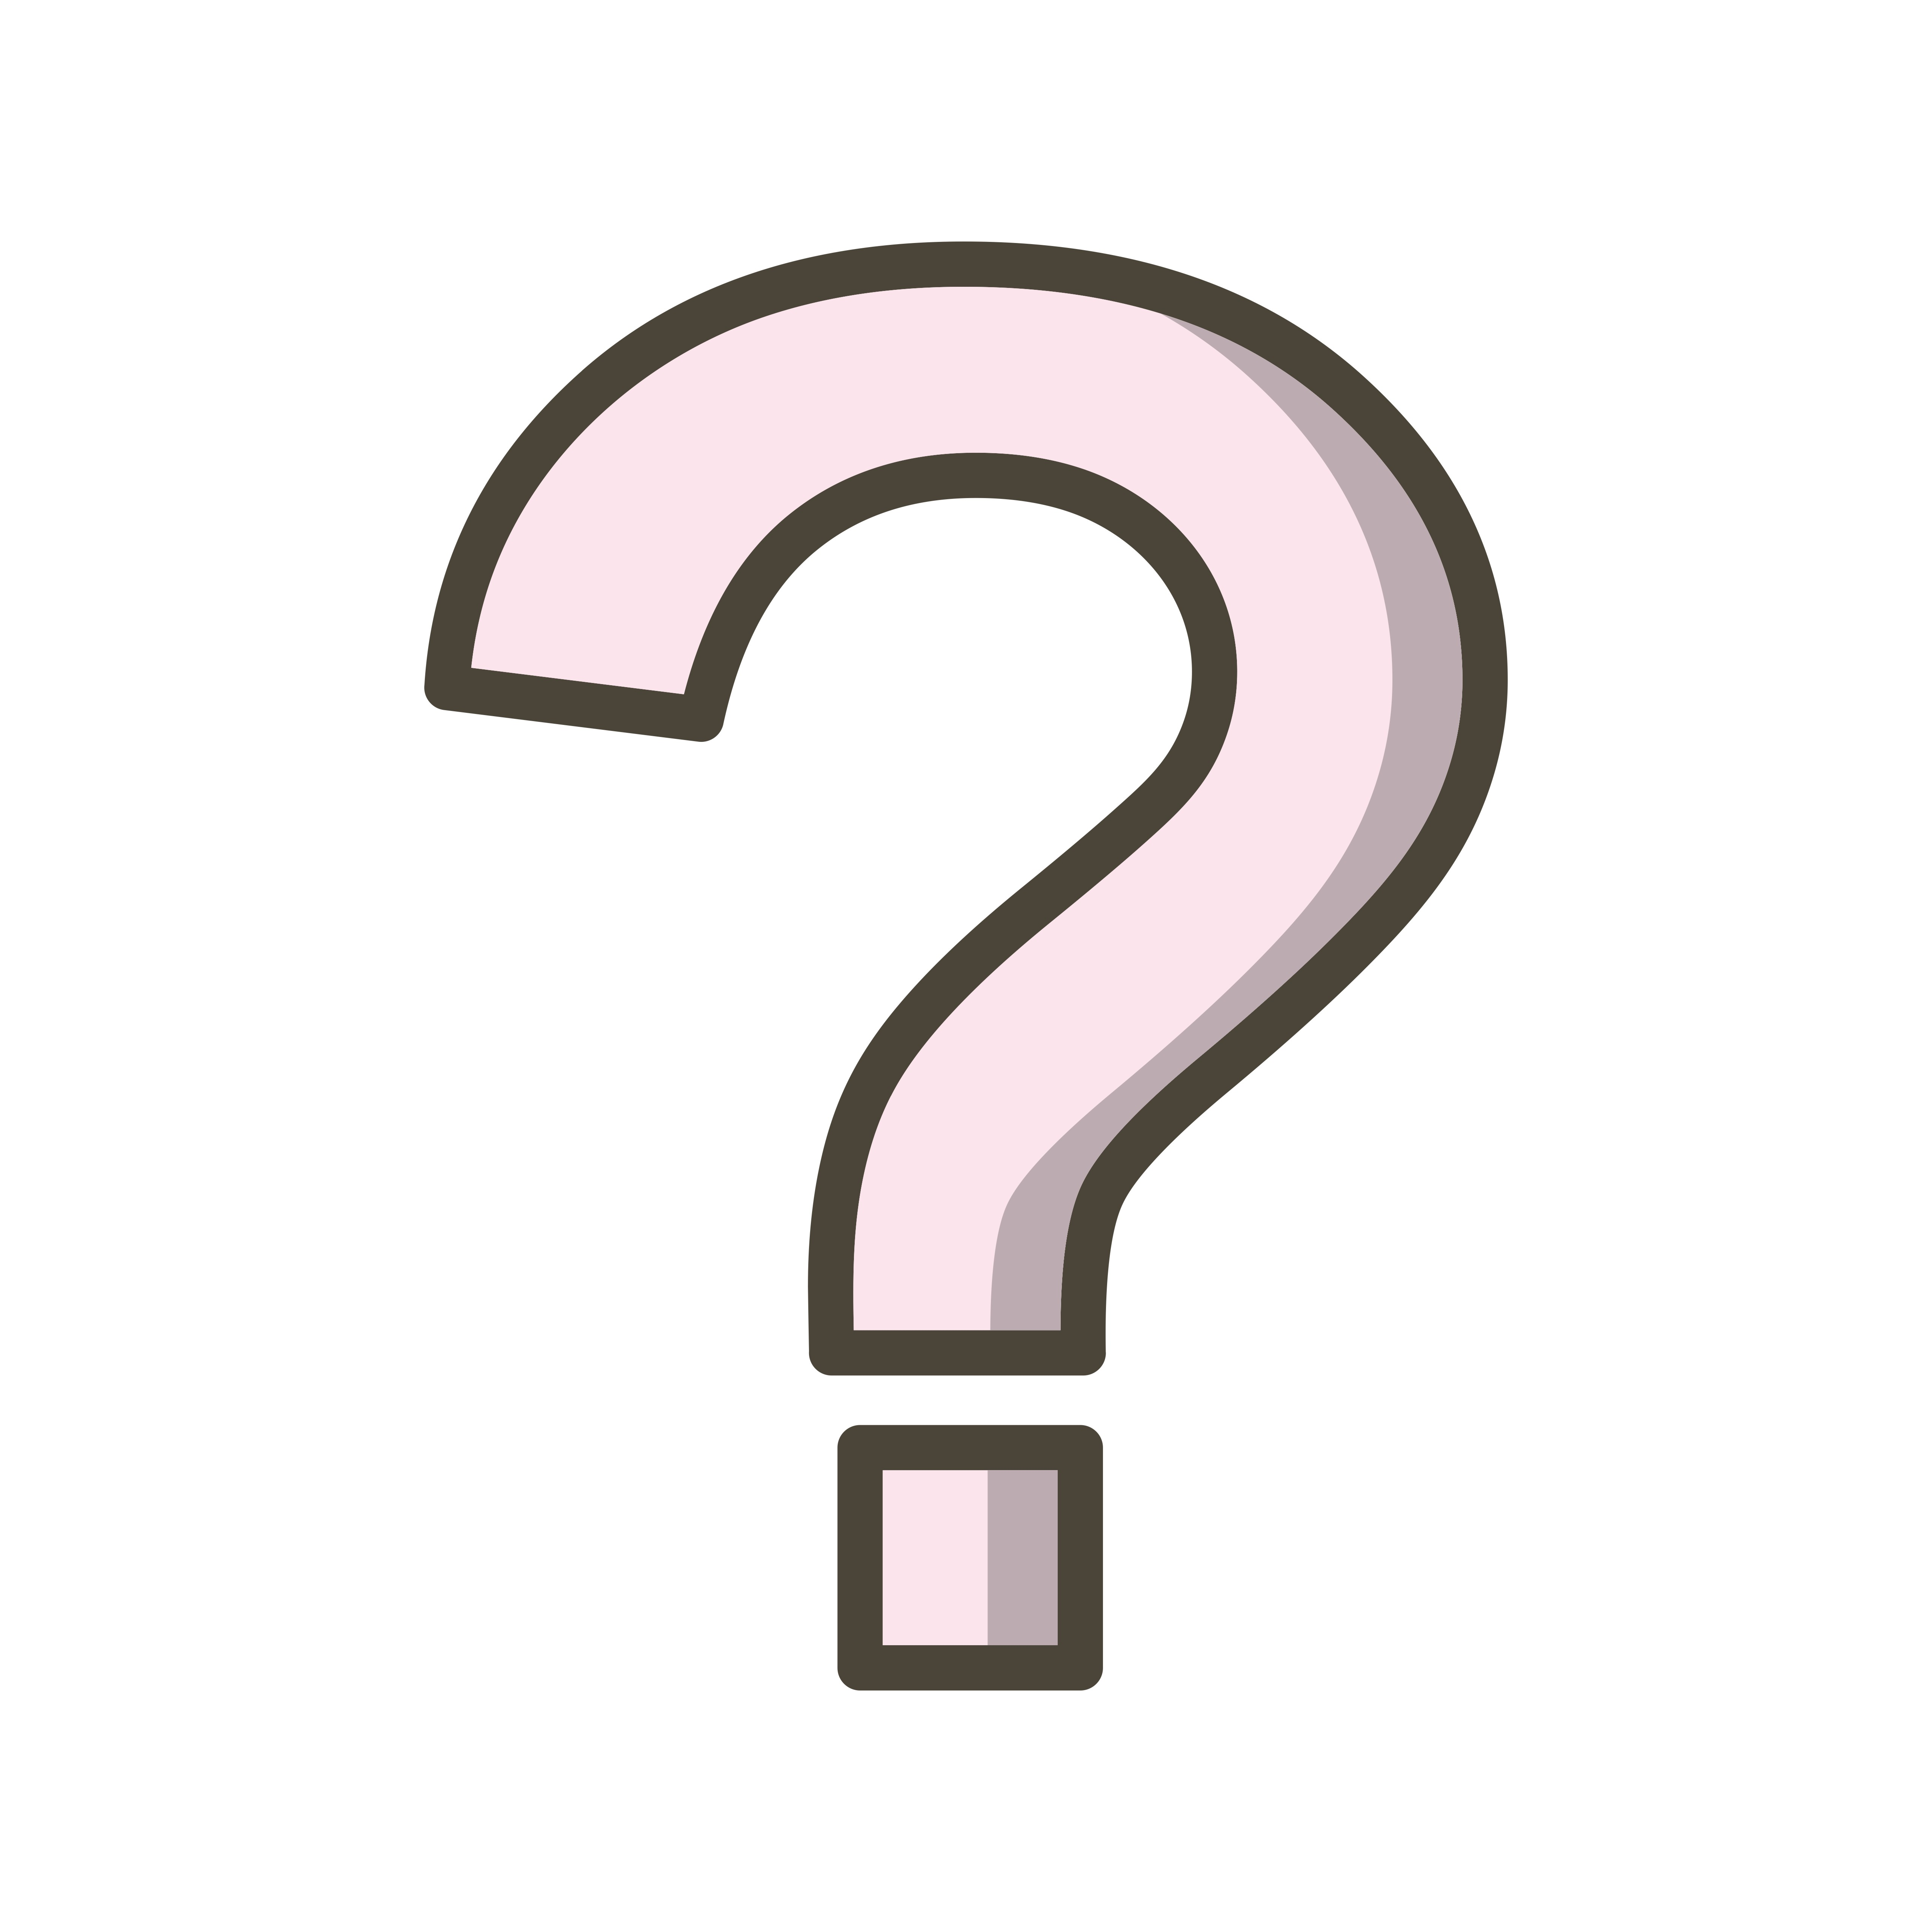 Question Mark Vector Icon - Download Free Vectors, Clipart ...